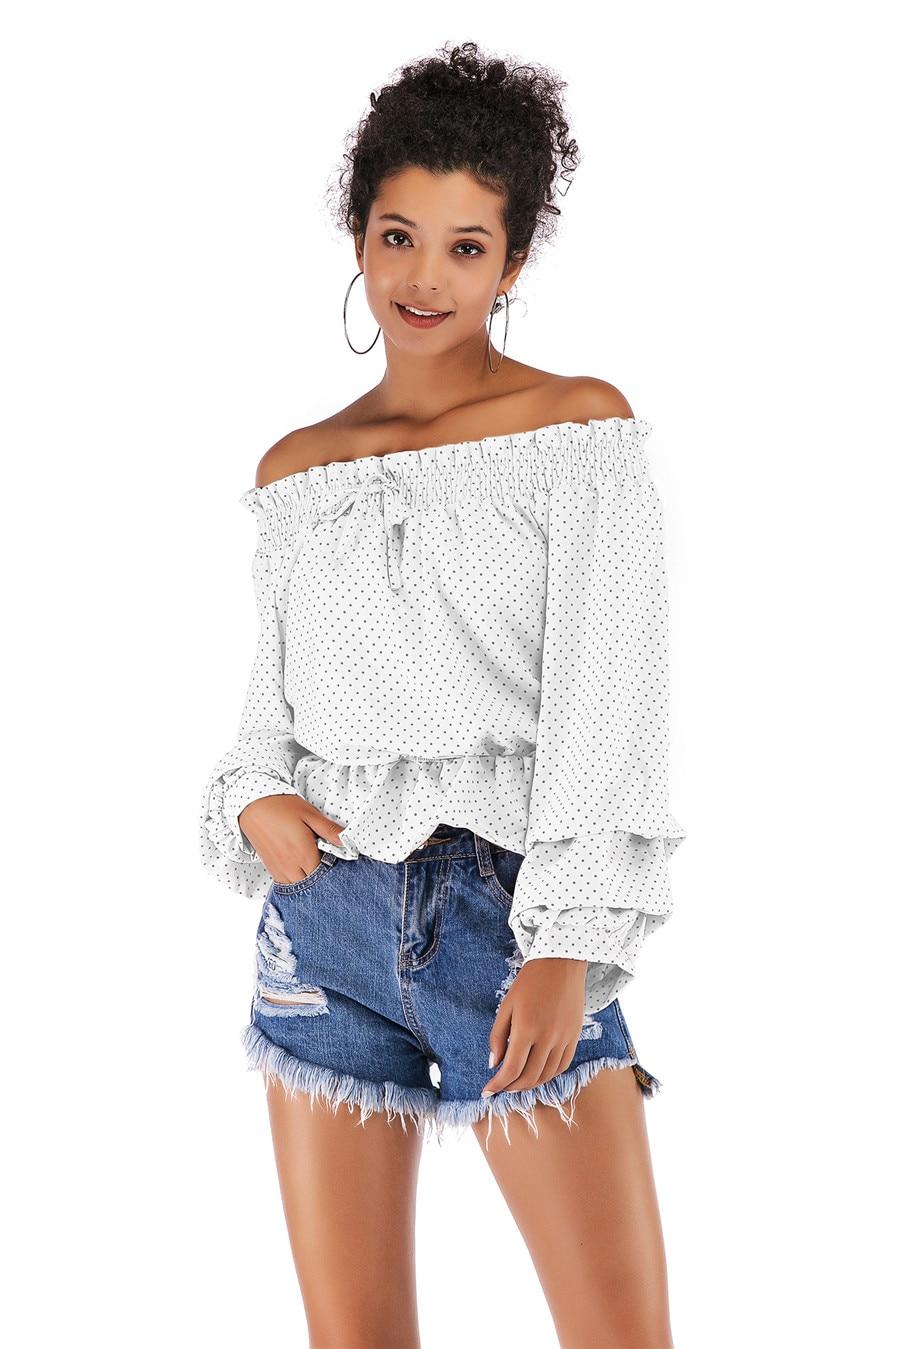 Gladiolus Chiffon Blouse Women 2019 Spring Autumn Long Sleeve Polka Dot Off Shoulder Sexy Blouses Women Shirts Ruffles Blusas (21)